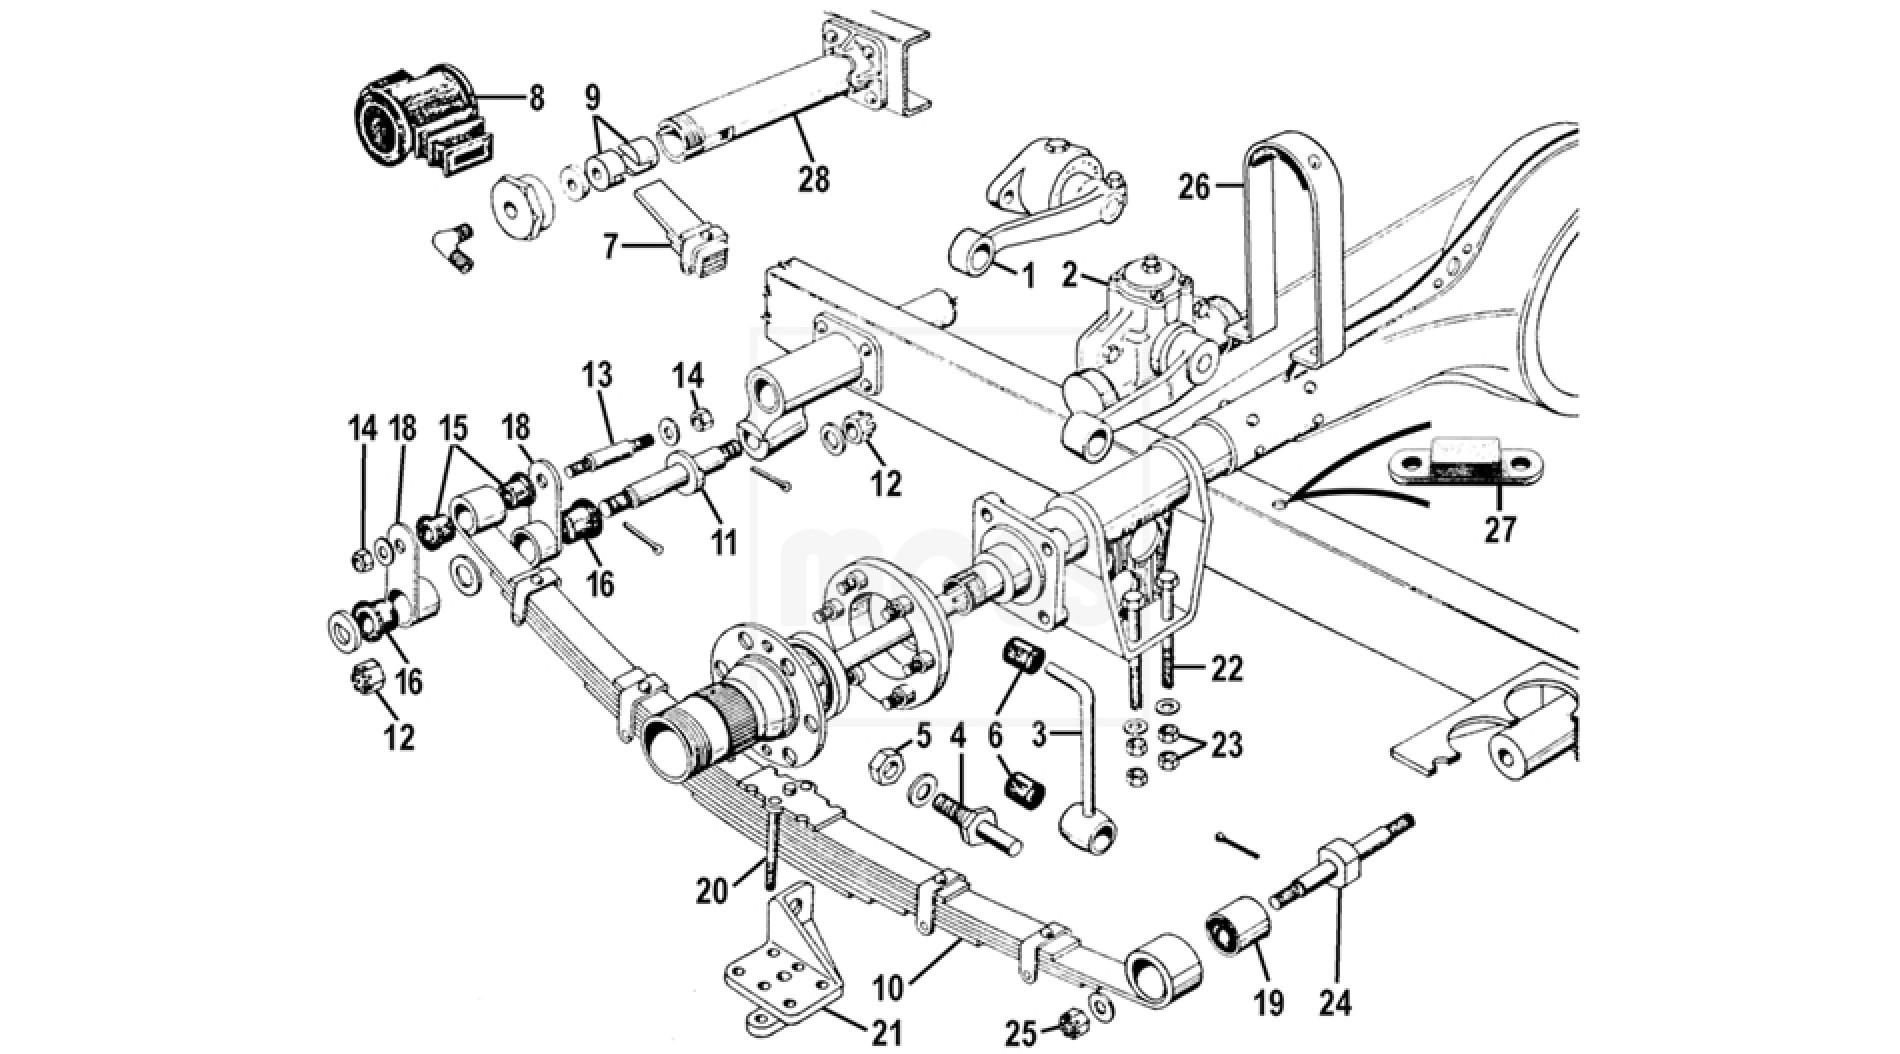 Suspension Diagram As Well Jaguar X Type Rear Suspension Diagram On